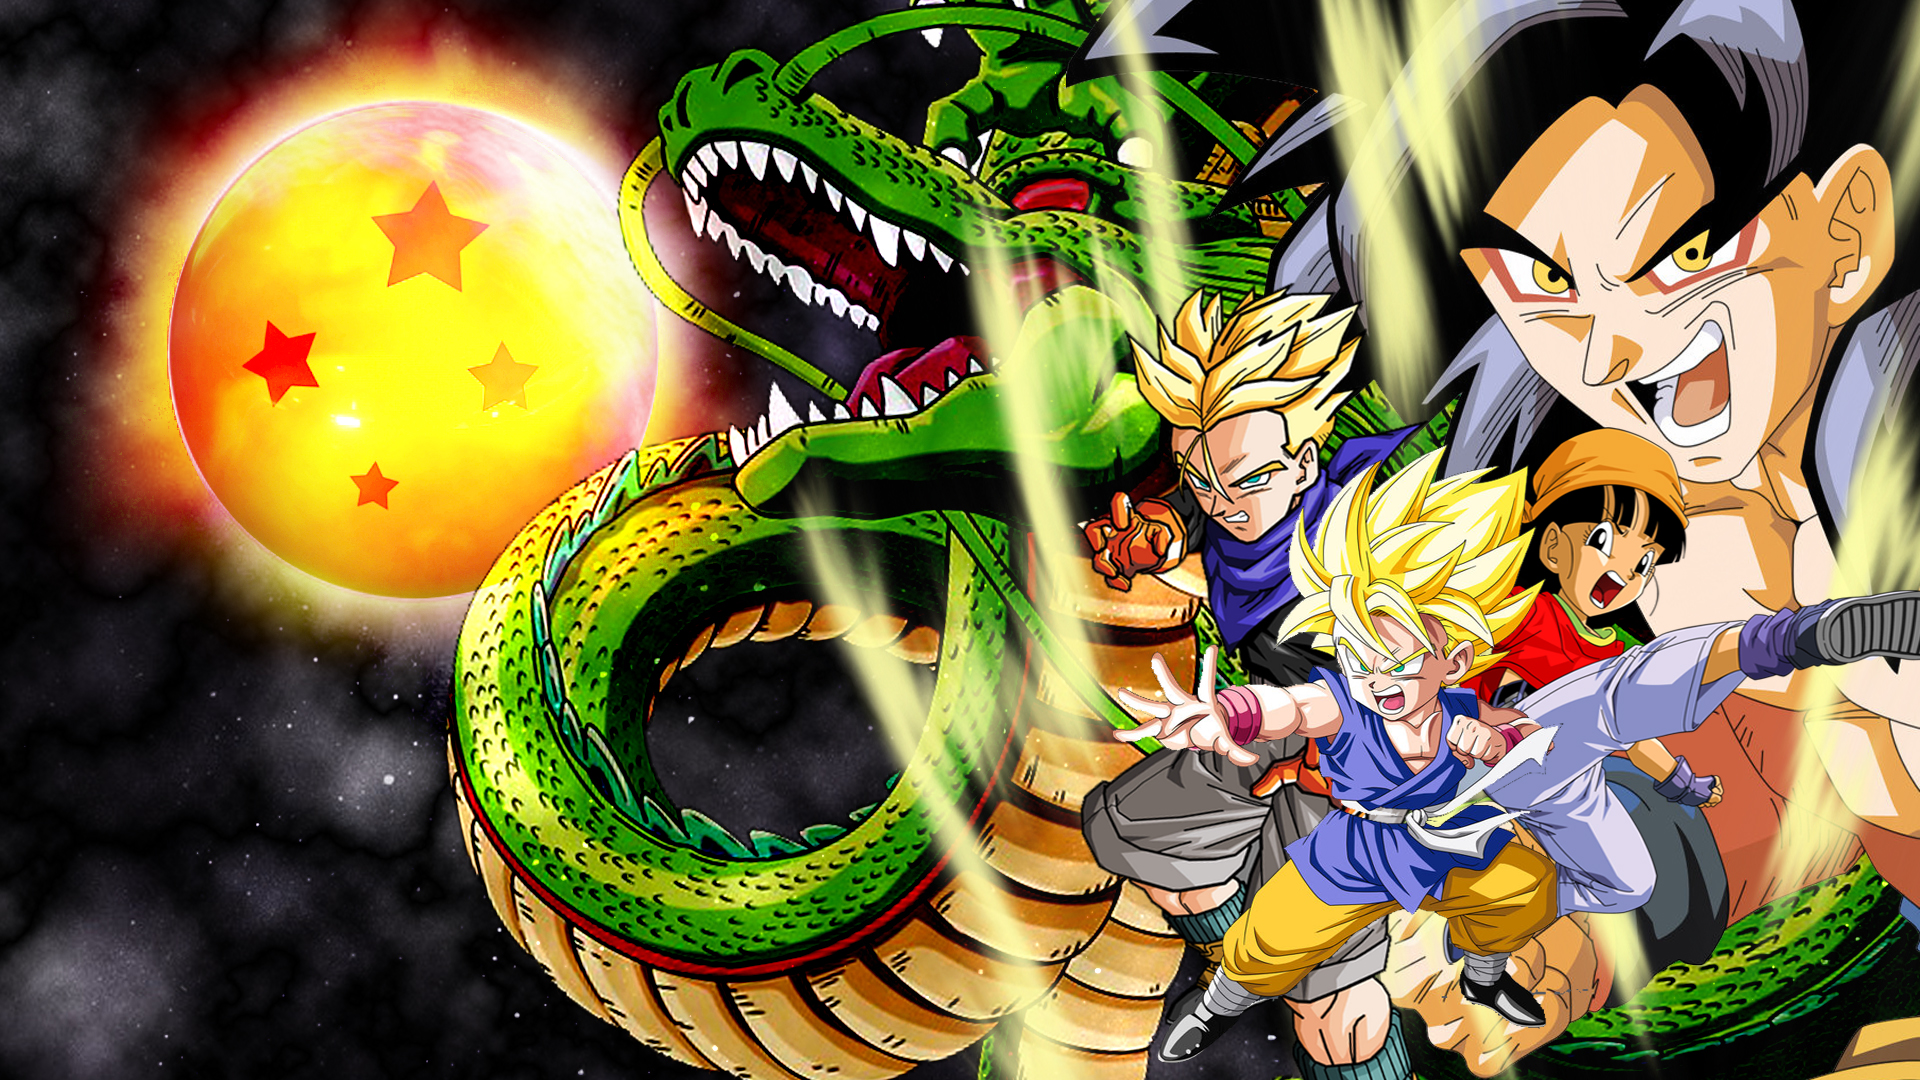 Free Download Dragon Ball Z Hd Wallpaper Background For Desktop